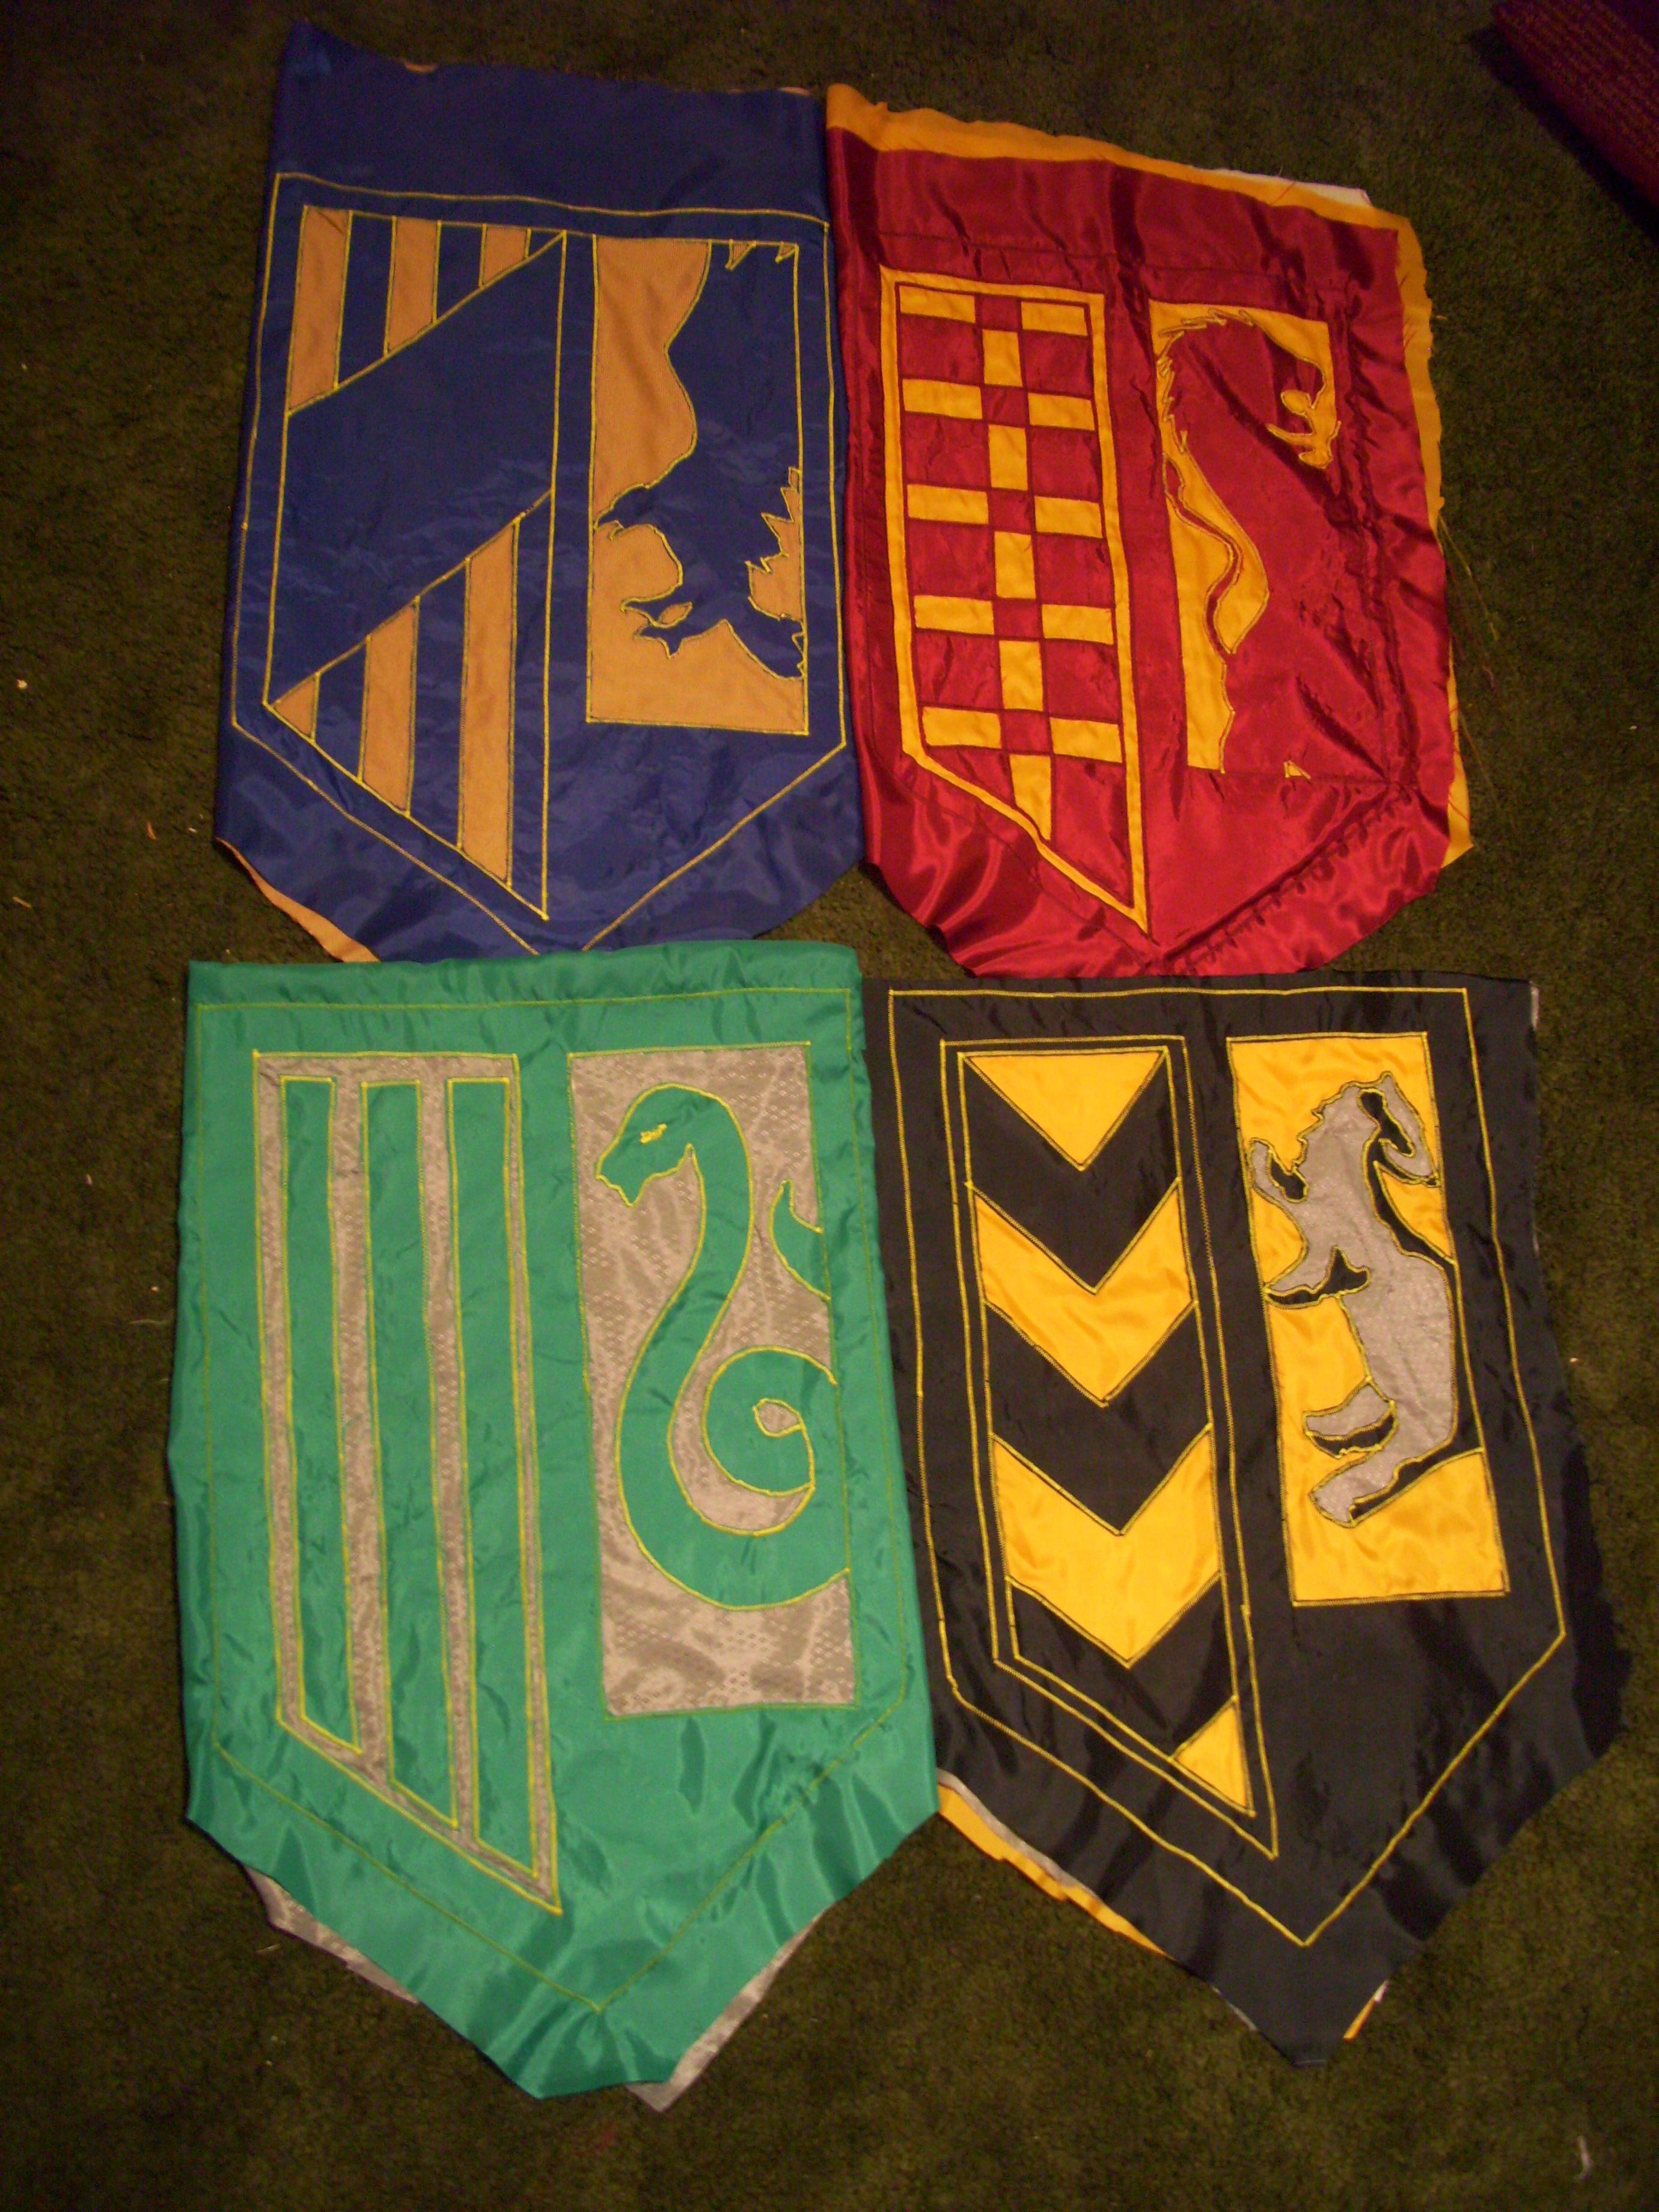 Harry Potter Wallpapers Hd For Desktop House Banners Hogwarts Yummycheffarley